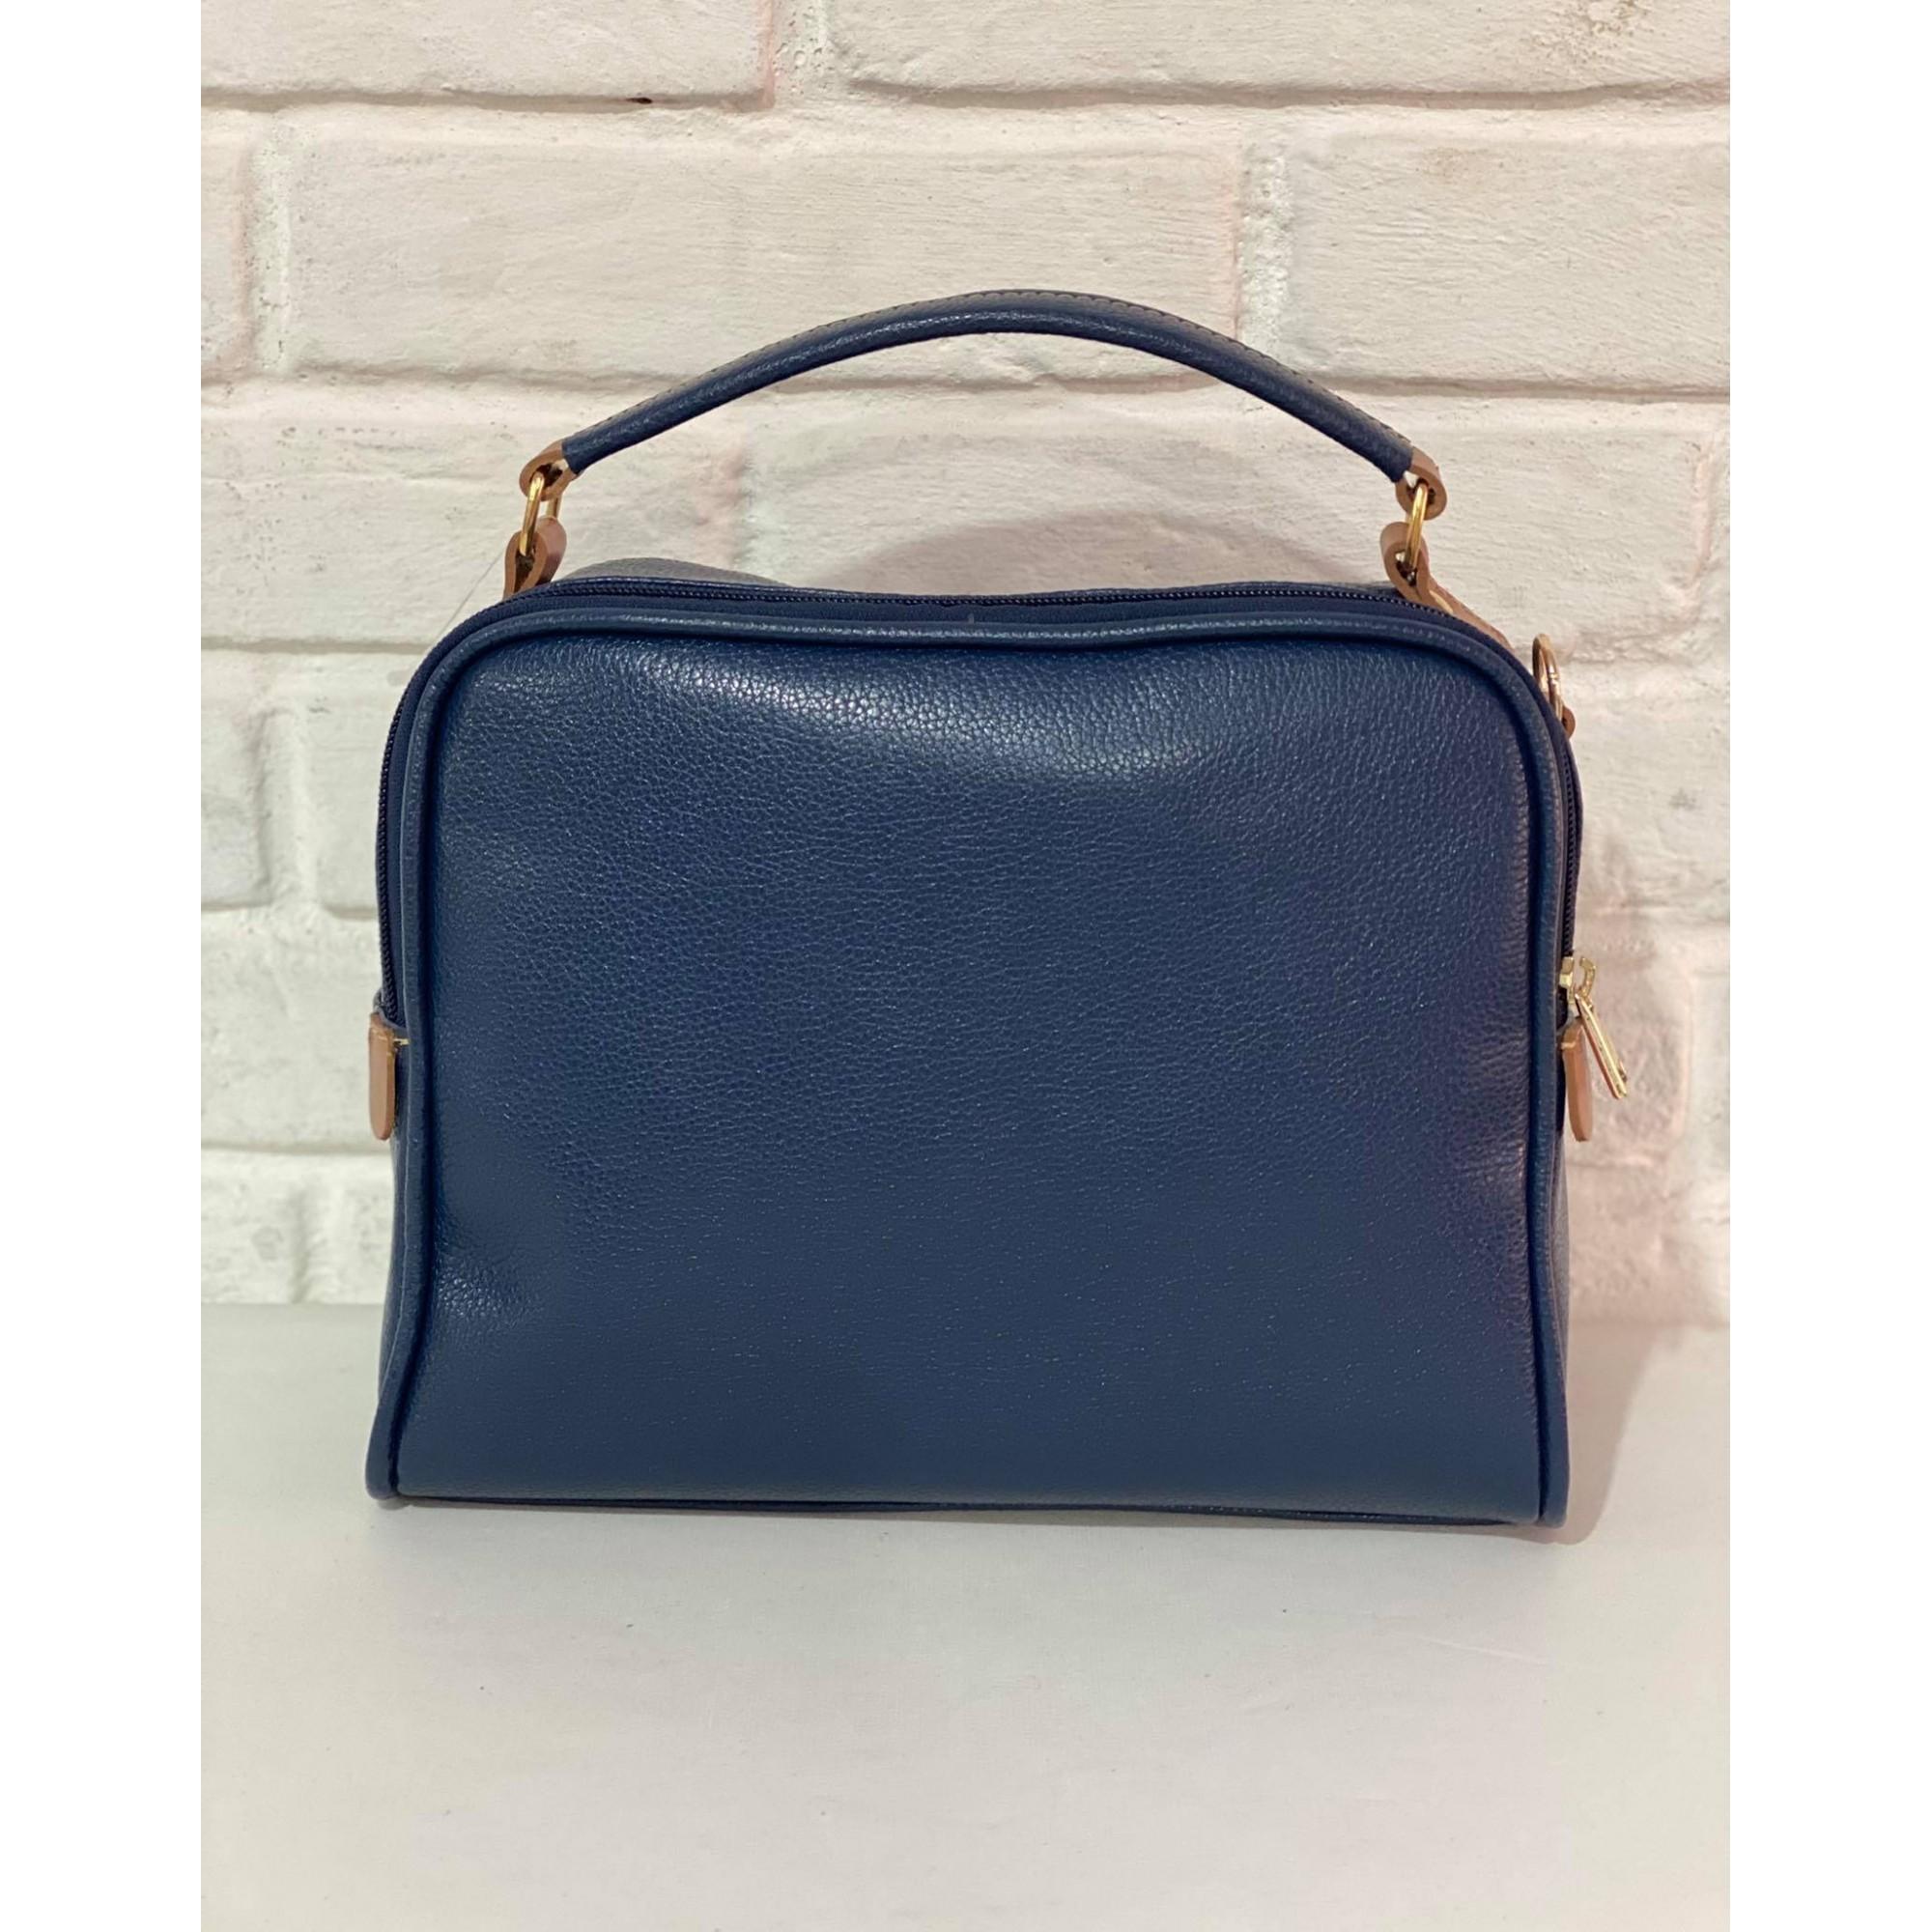 Bolsa Prata Couro Transversal 1010840 Azul